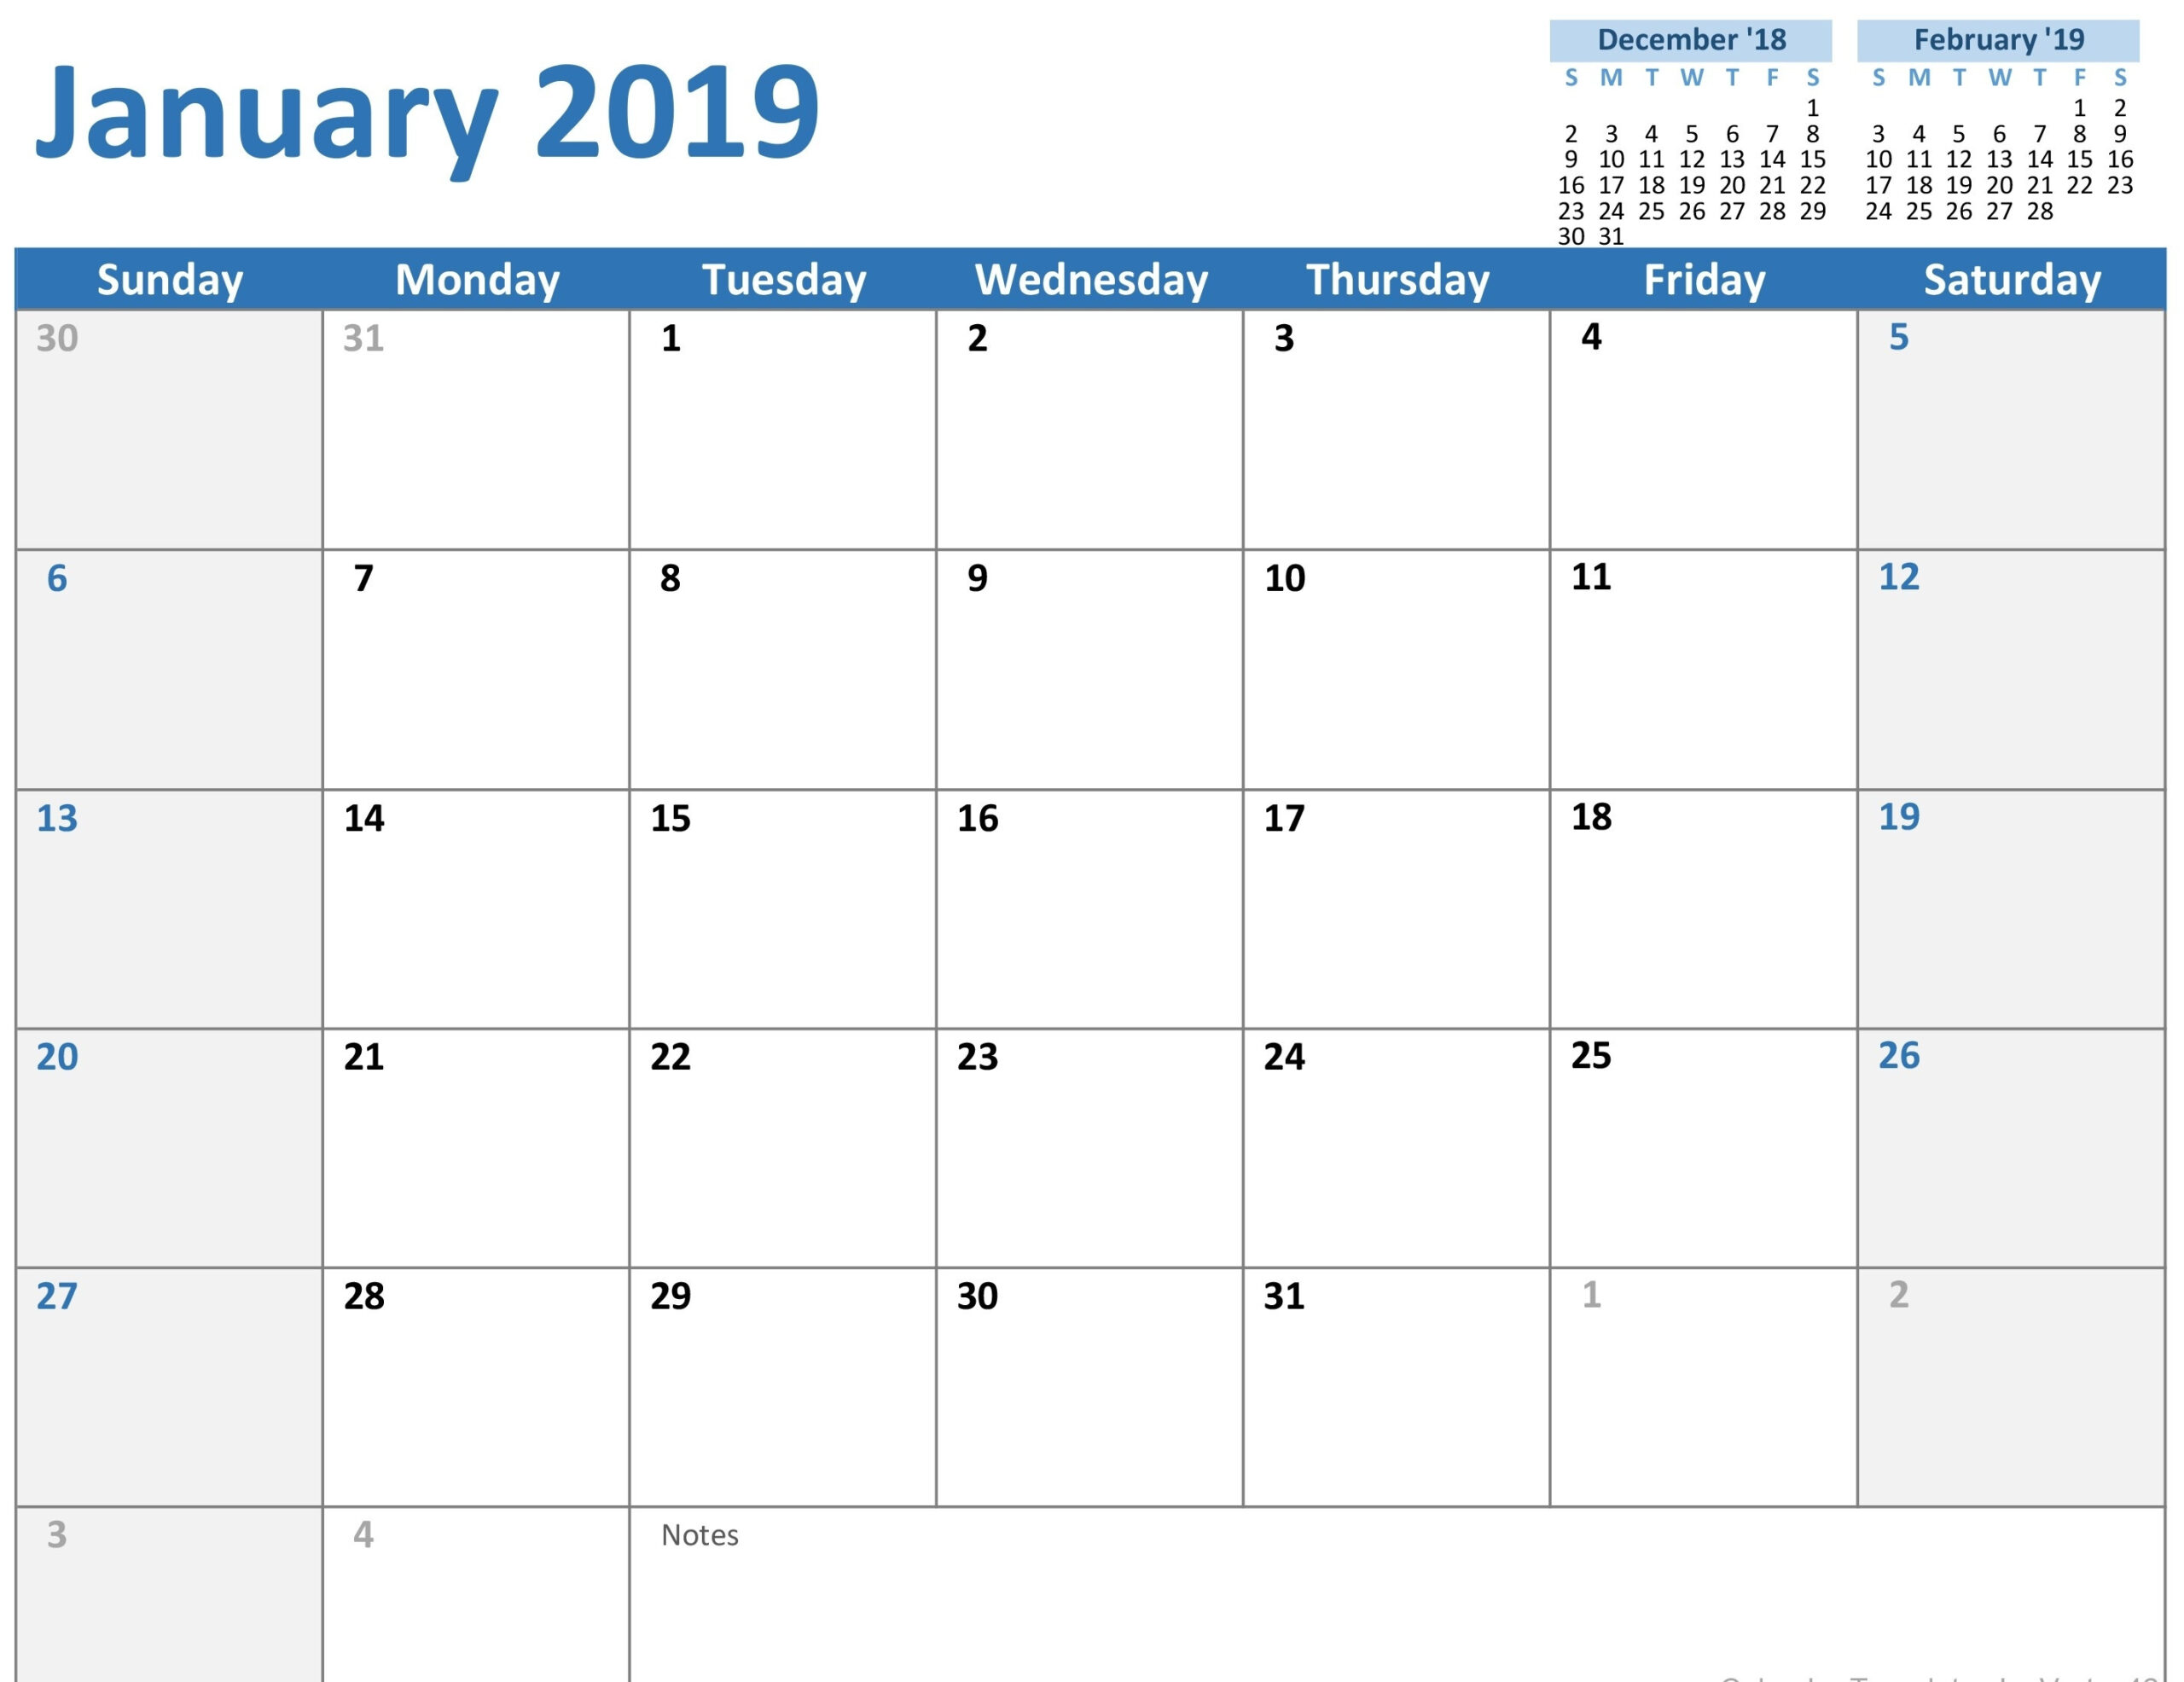 Calendar Template Microsoft Word | Free Calendar Template  Kishor Jantri 2021 Pdf